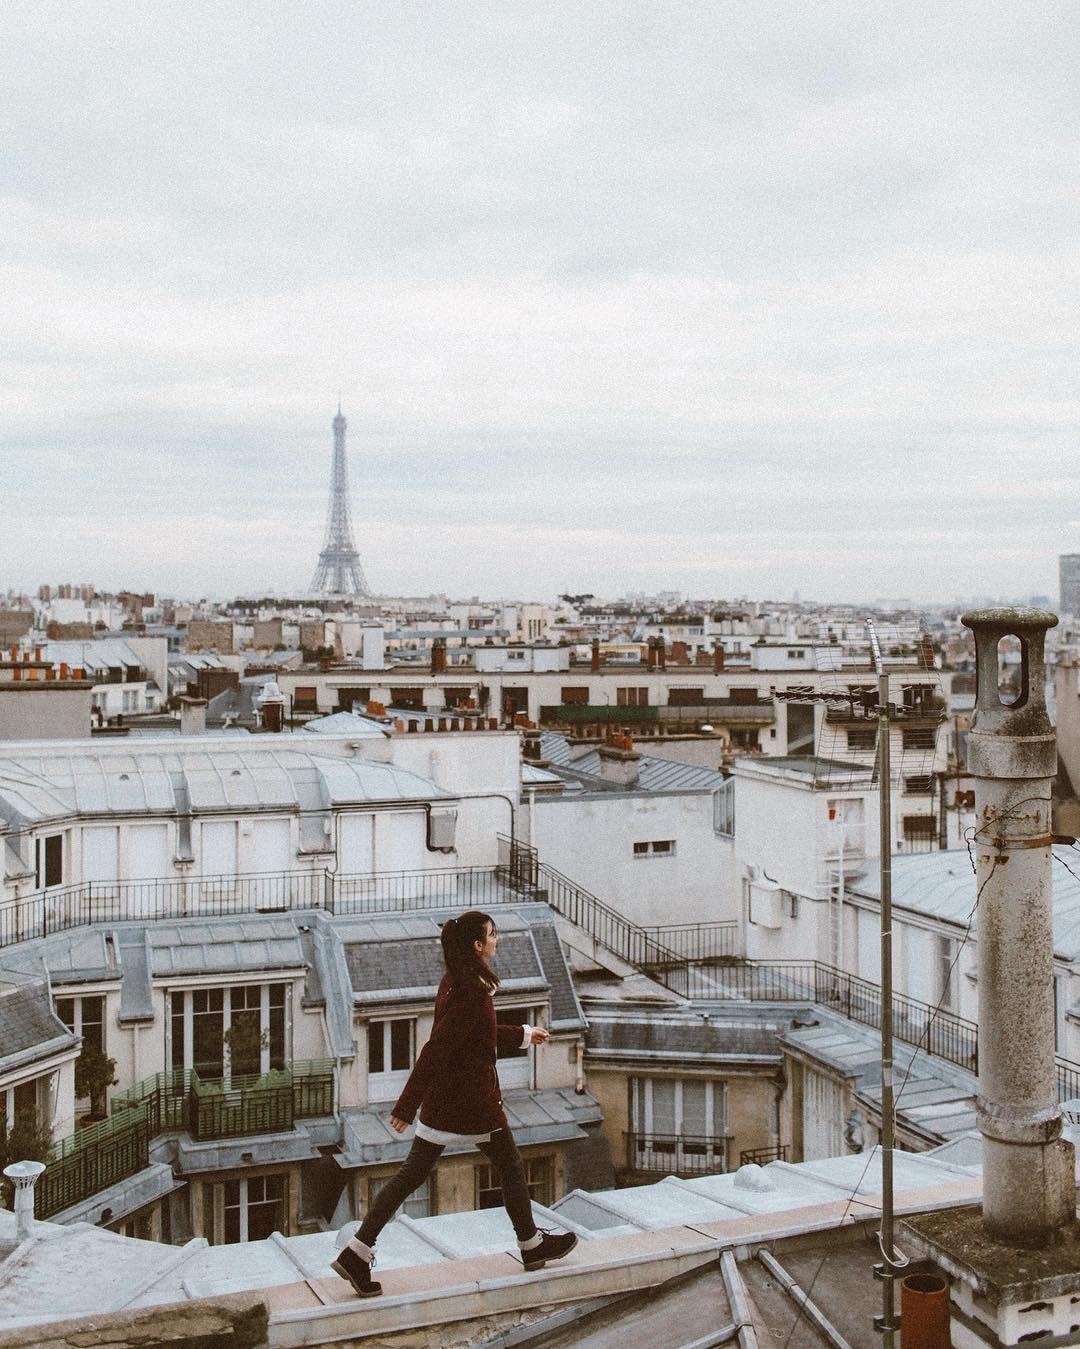 Regardez Cette Photo Instagram De Lisa Sakva 589 J Aime Resor Frankrike Arkitektur